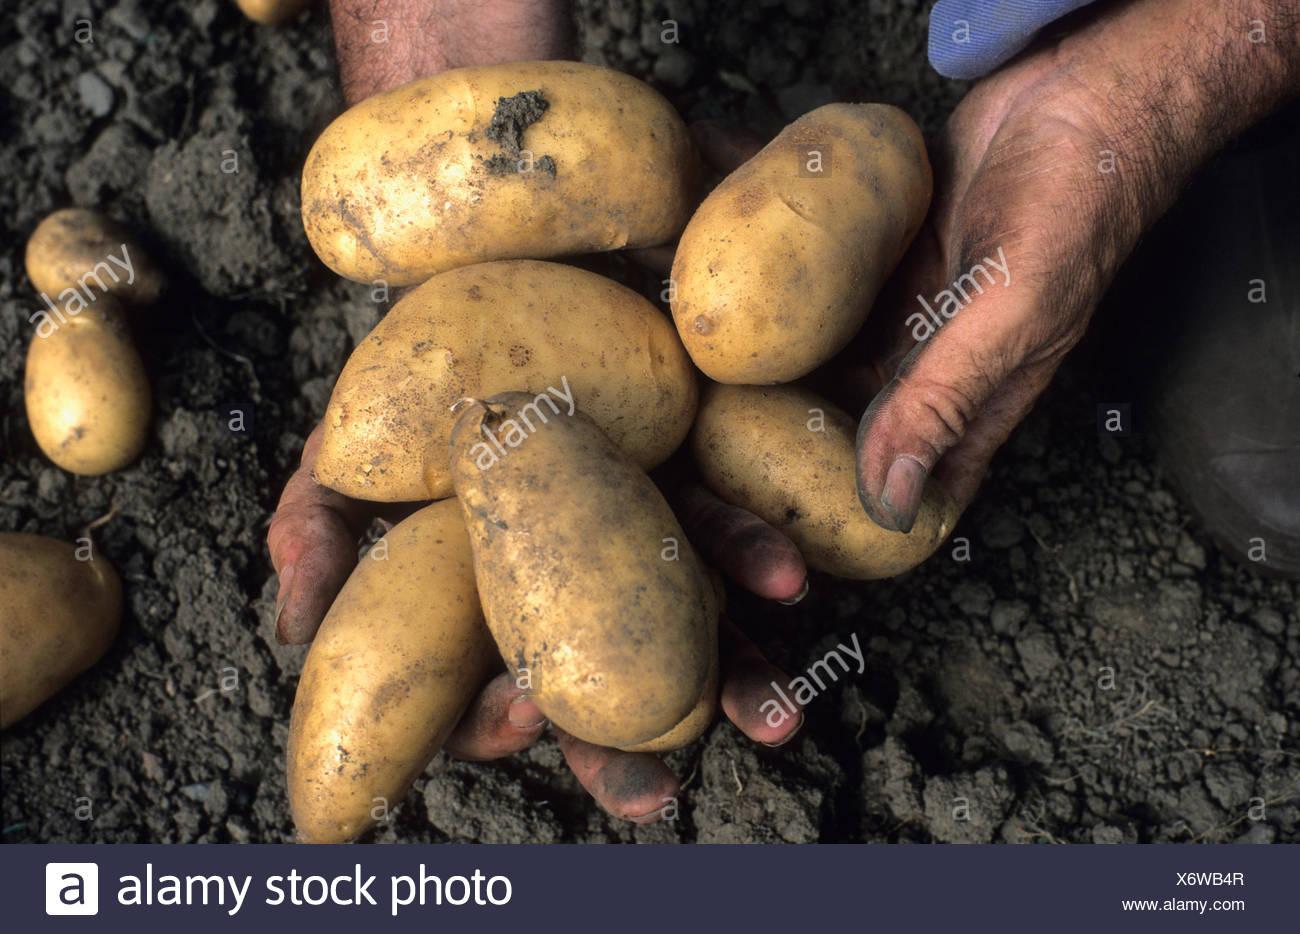 Dirty hands of gardener holding potatoes Stock Photo: 279611383 - Alamy